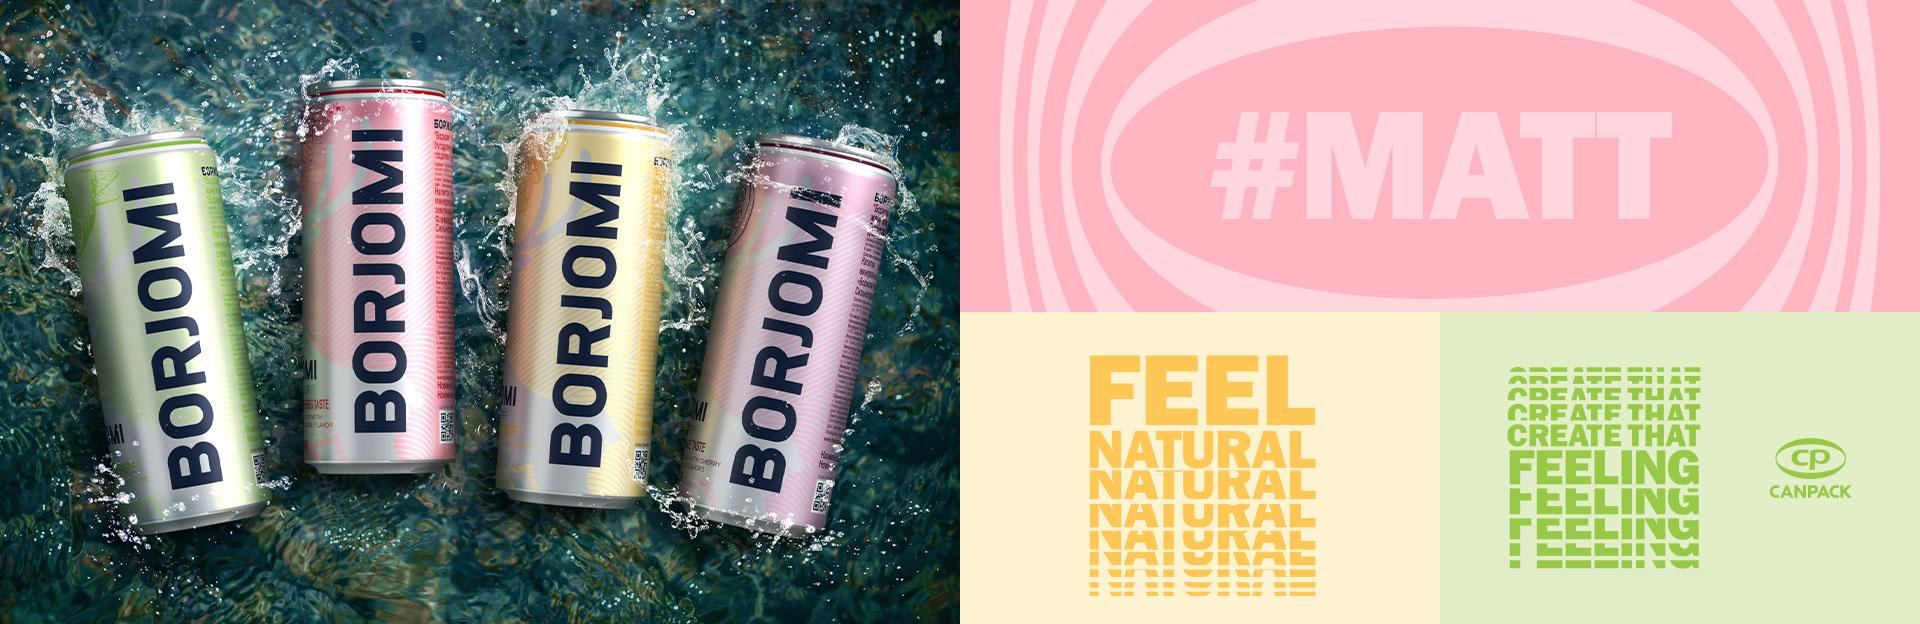 Create that feeling - Feel Natural - #Matt